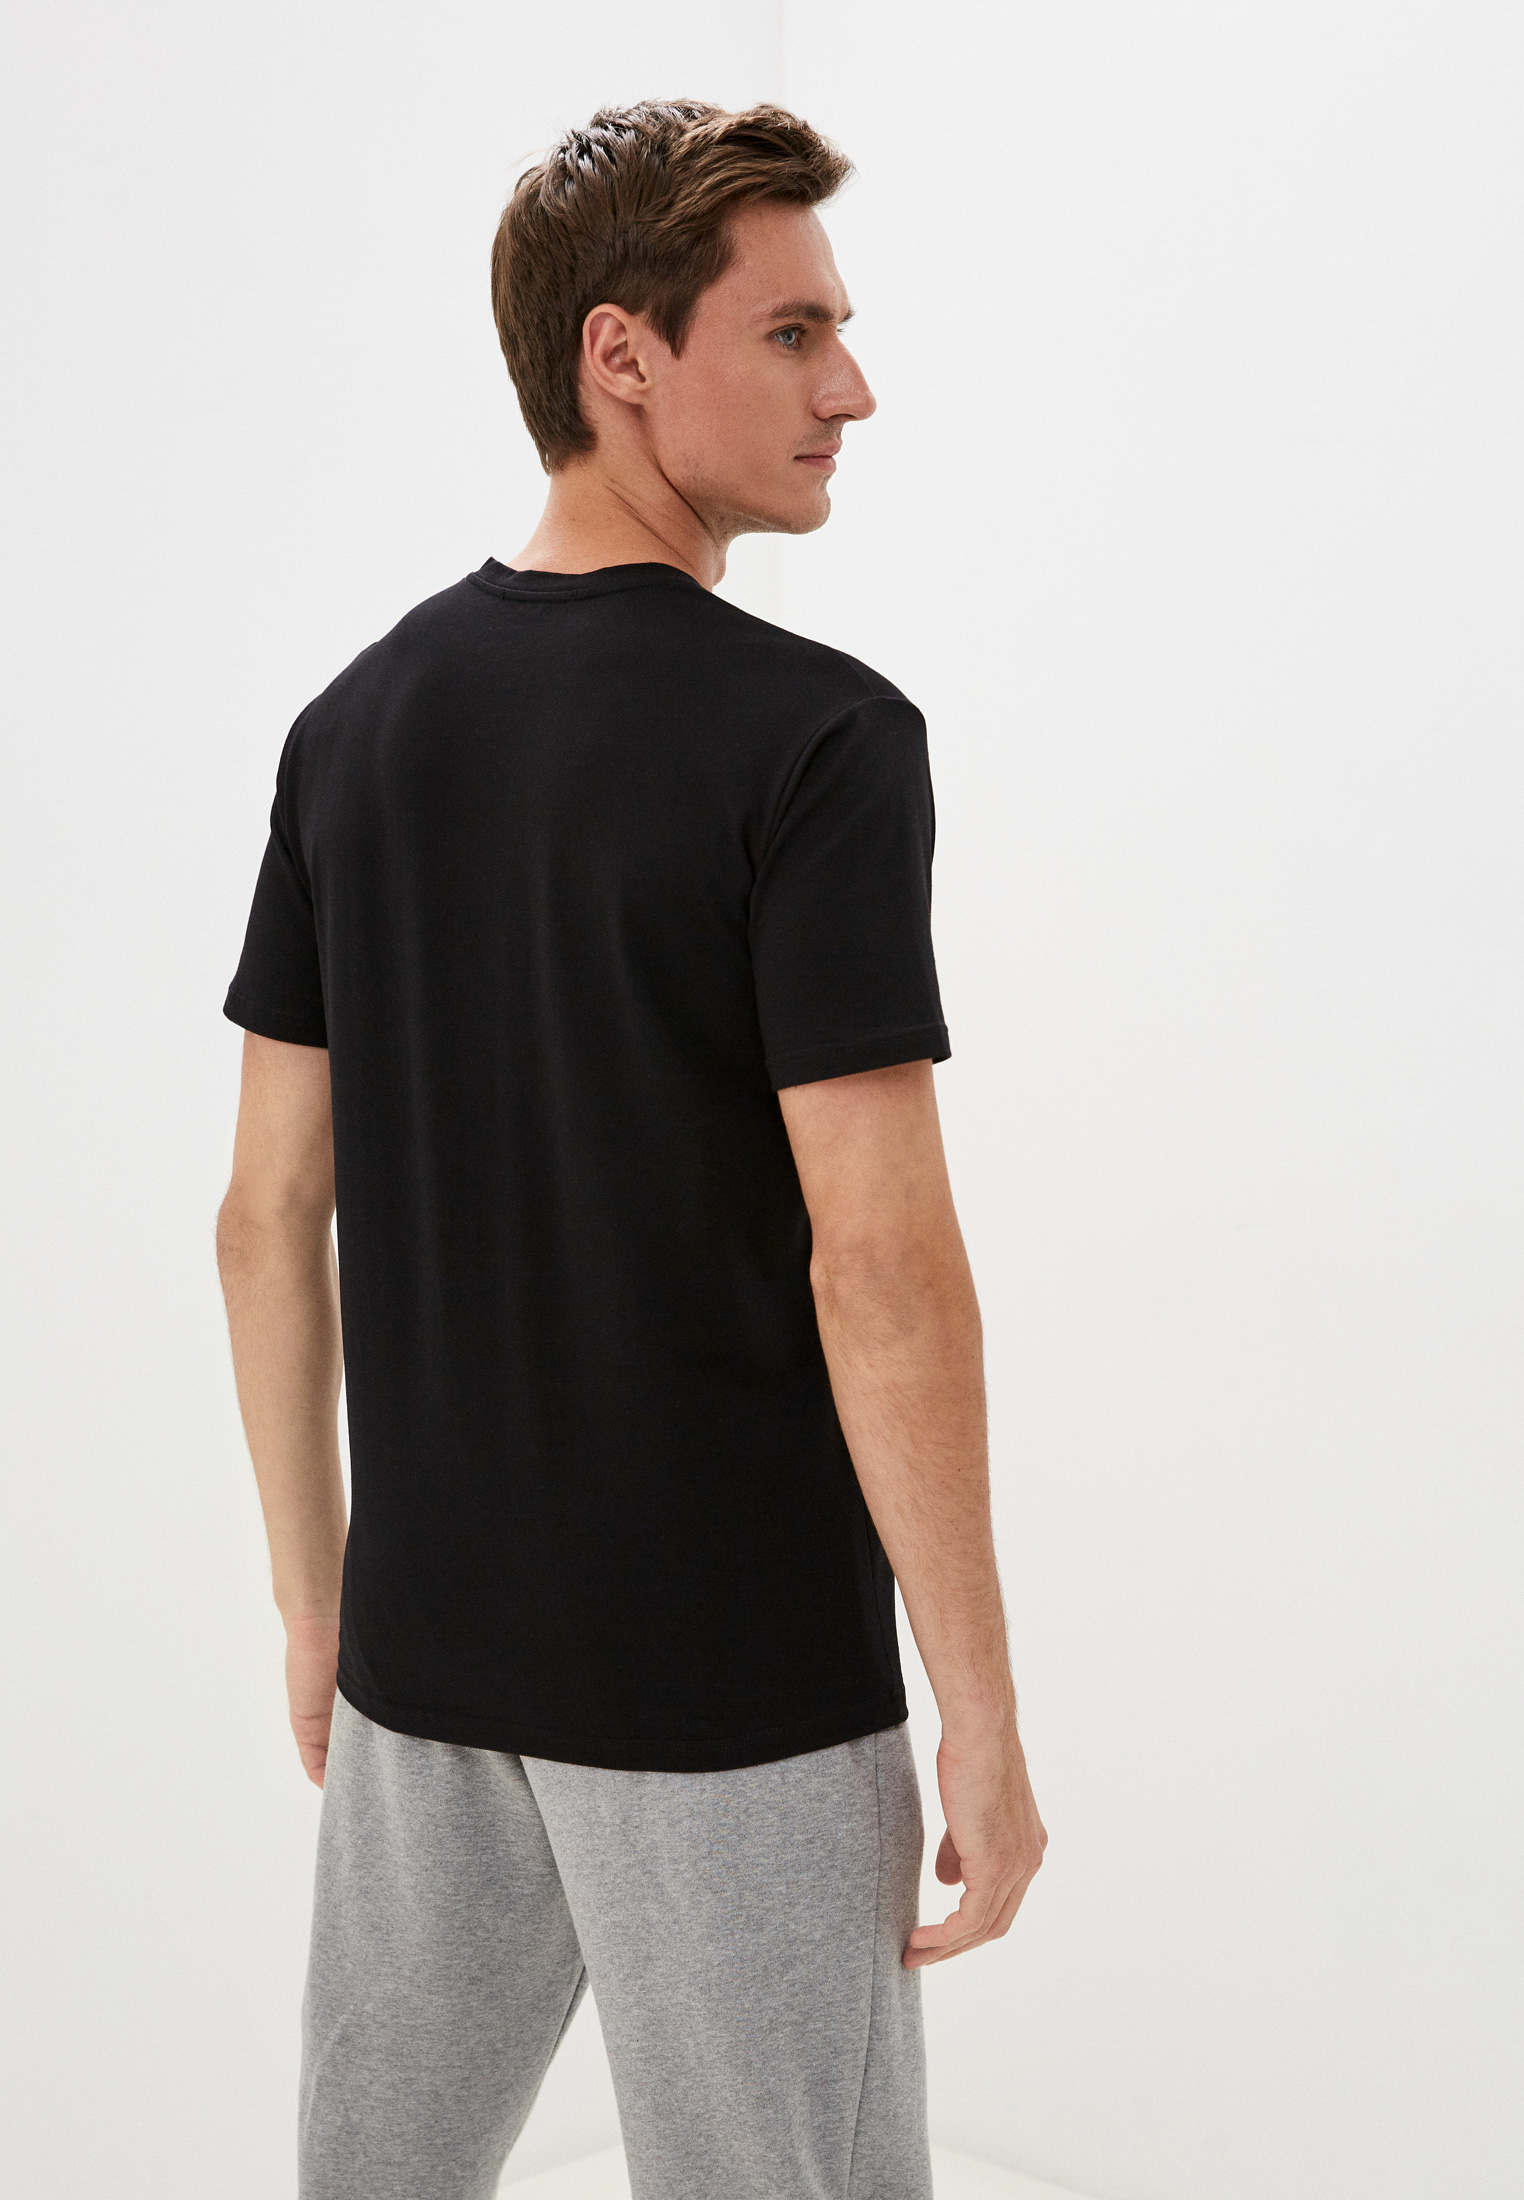 Мужская футболка Baldinini (Балдинини) TSU02: изображение 4